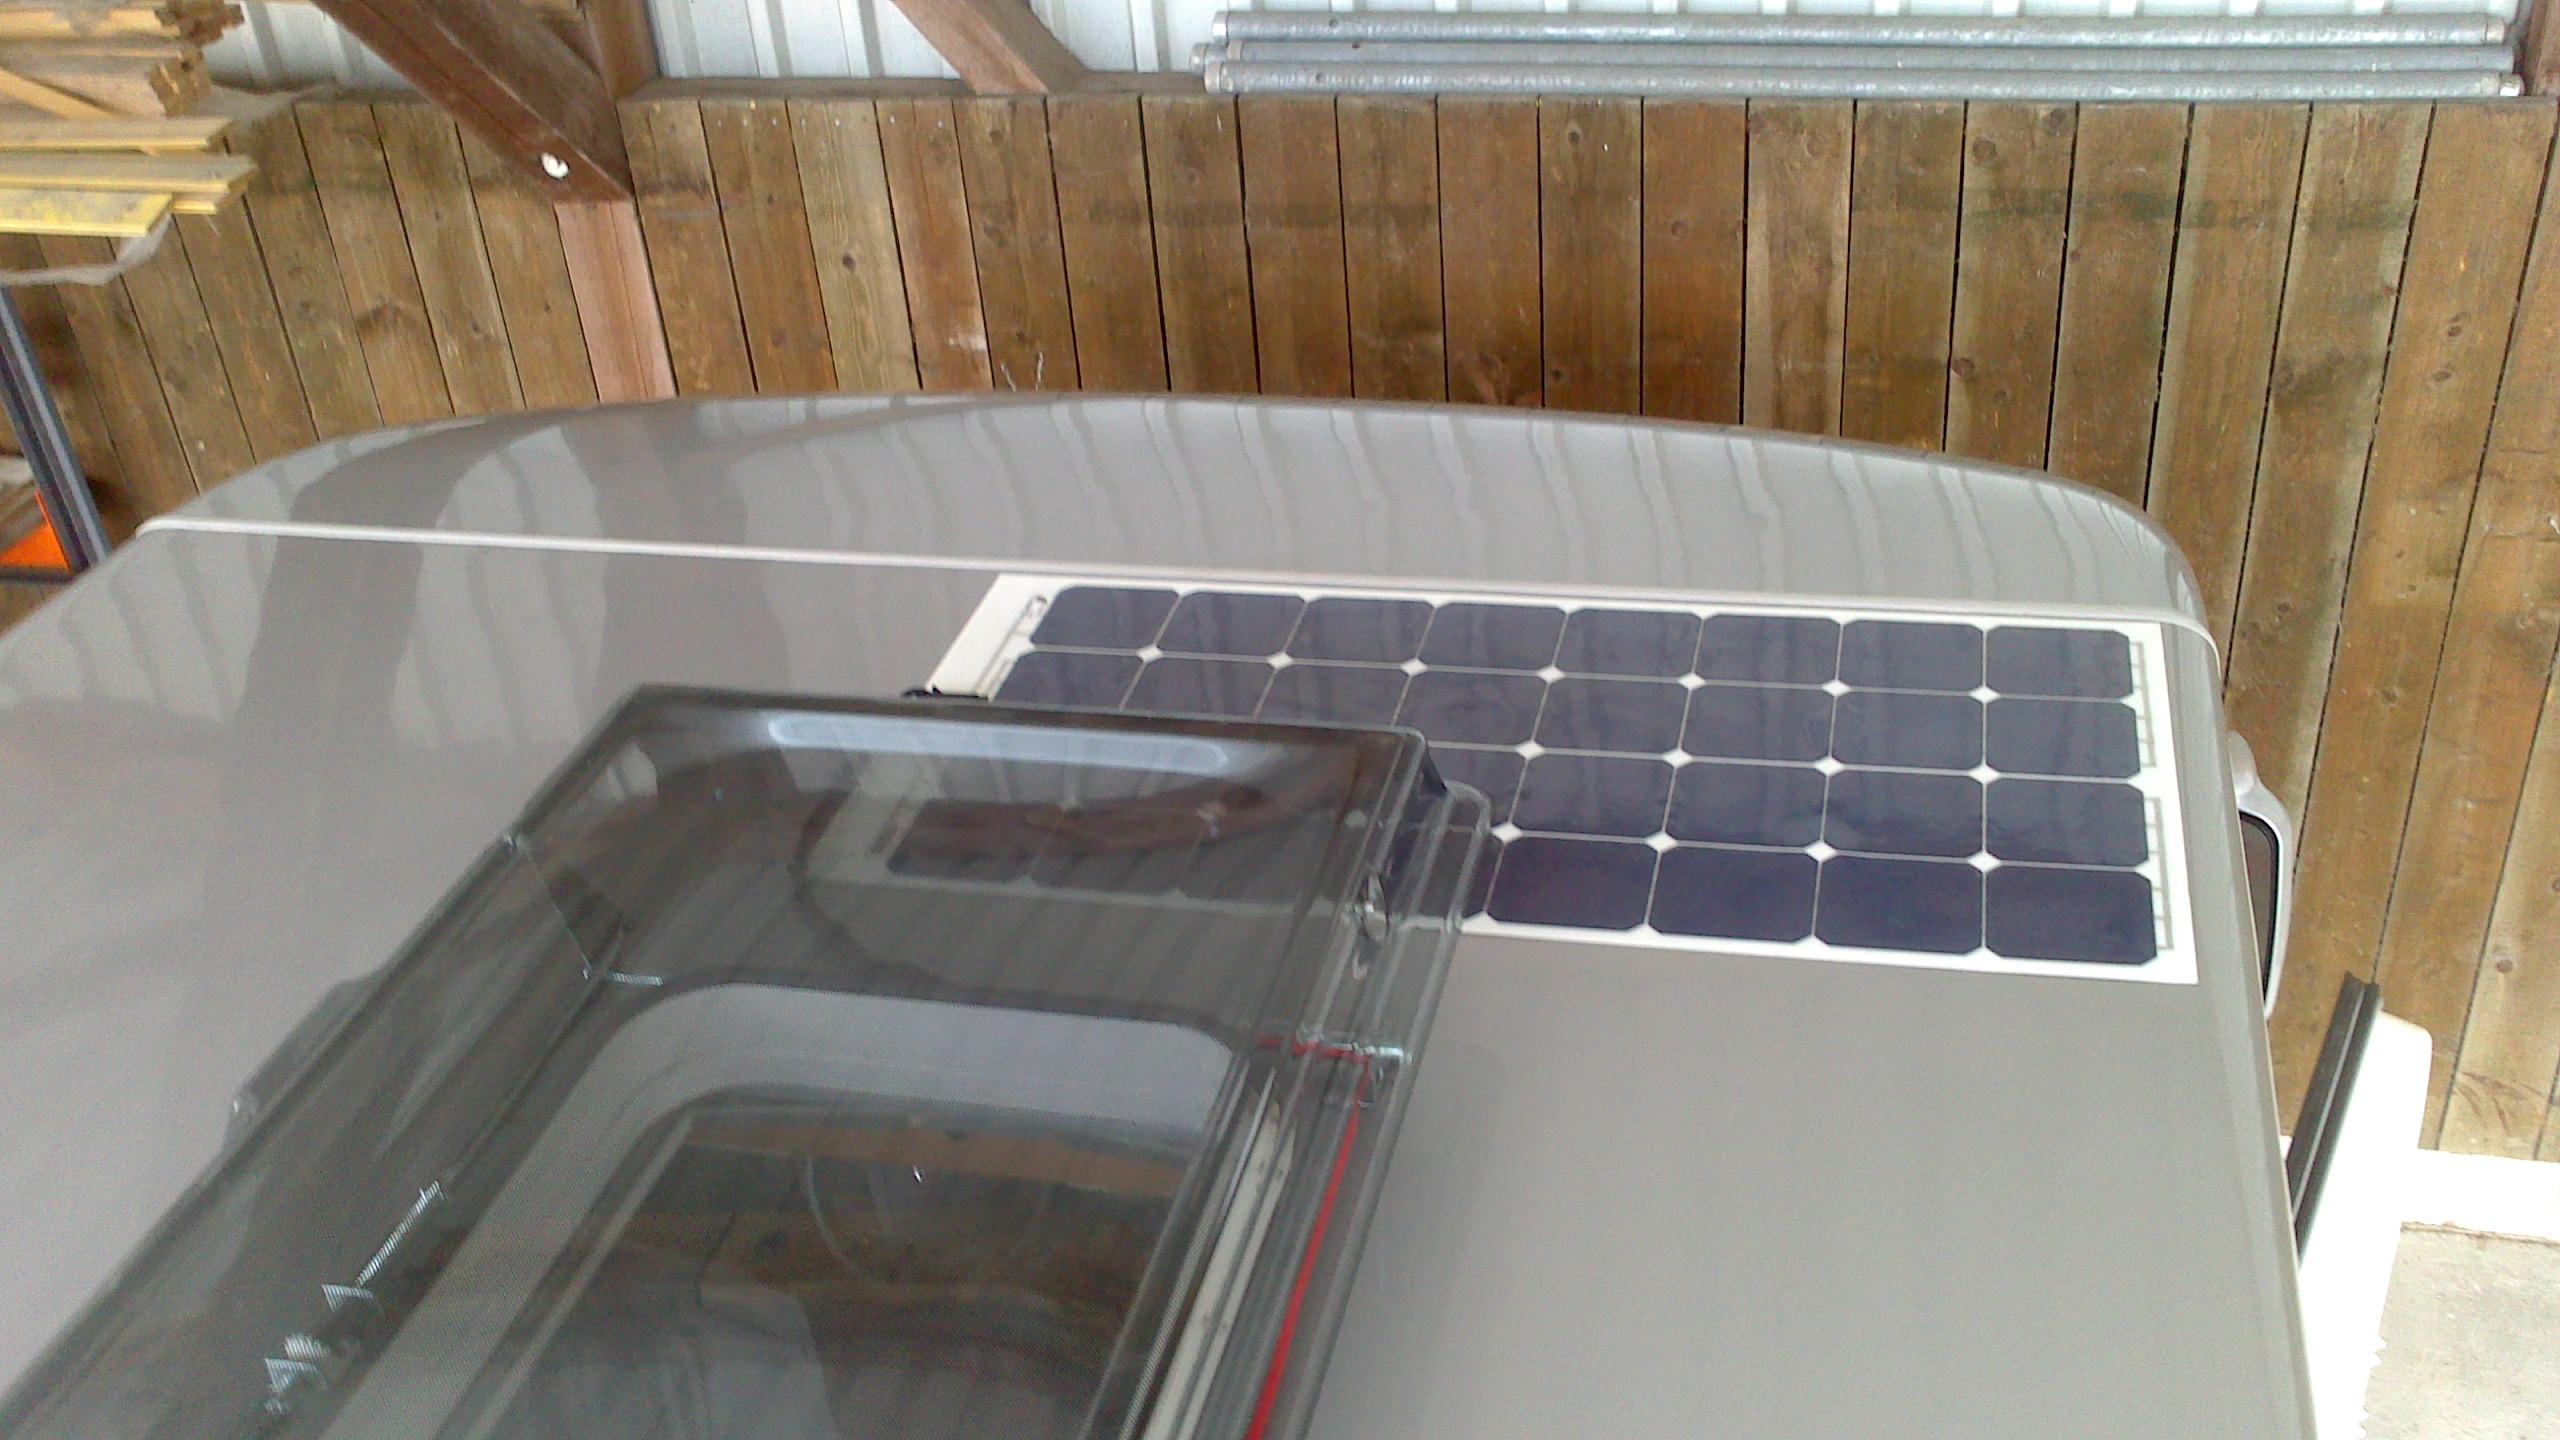 Surriscaldamento pannelli solari flessibili  Pagina 1  I Forum di CamperOnLine